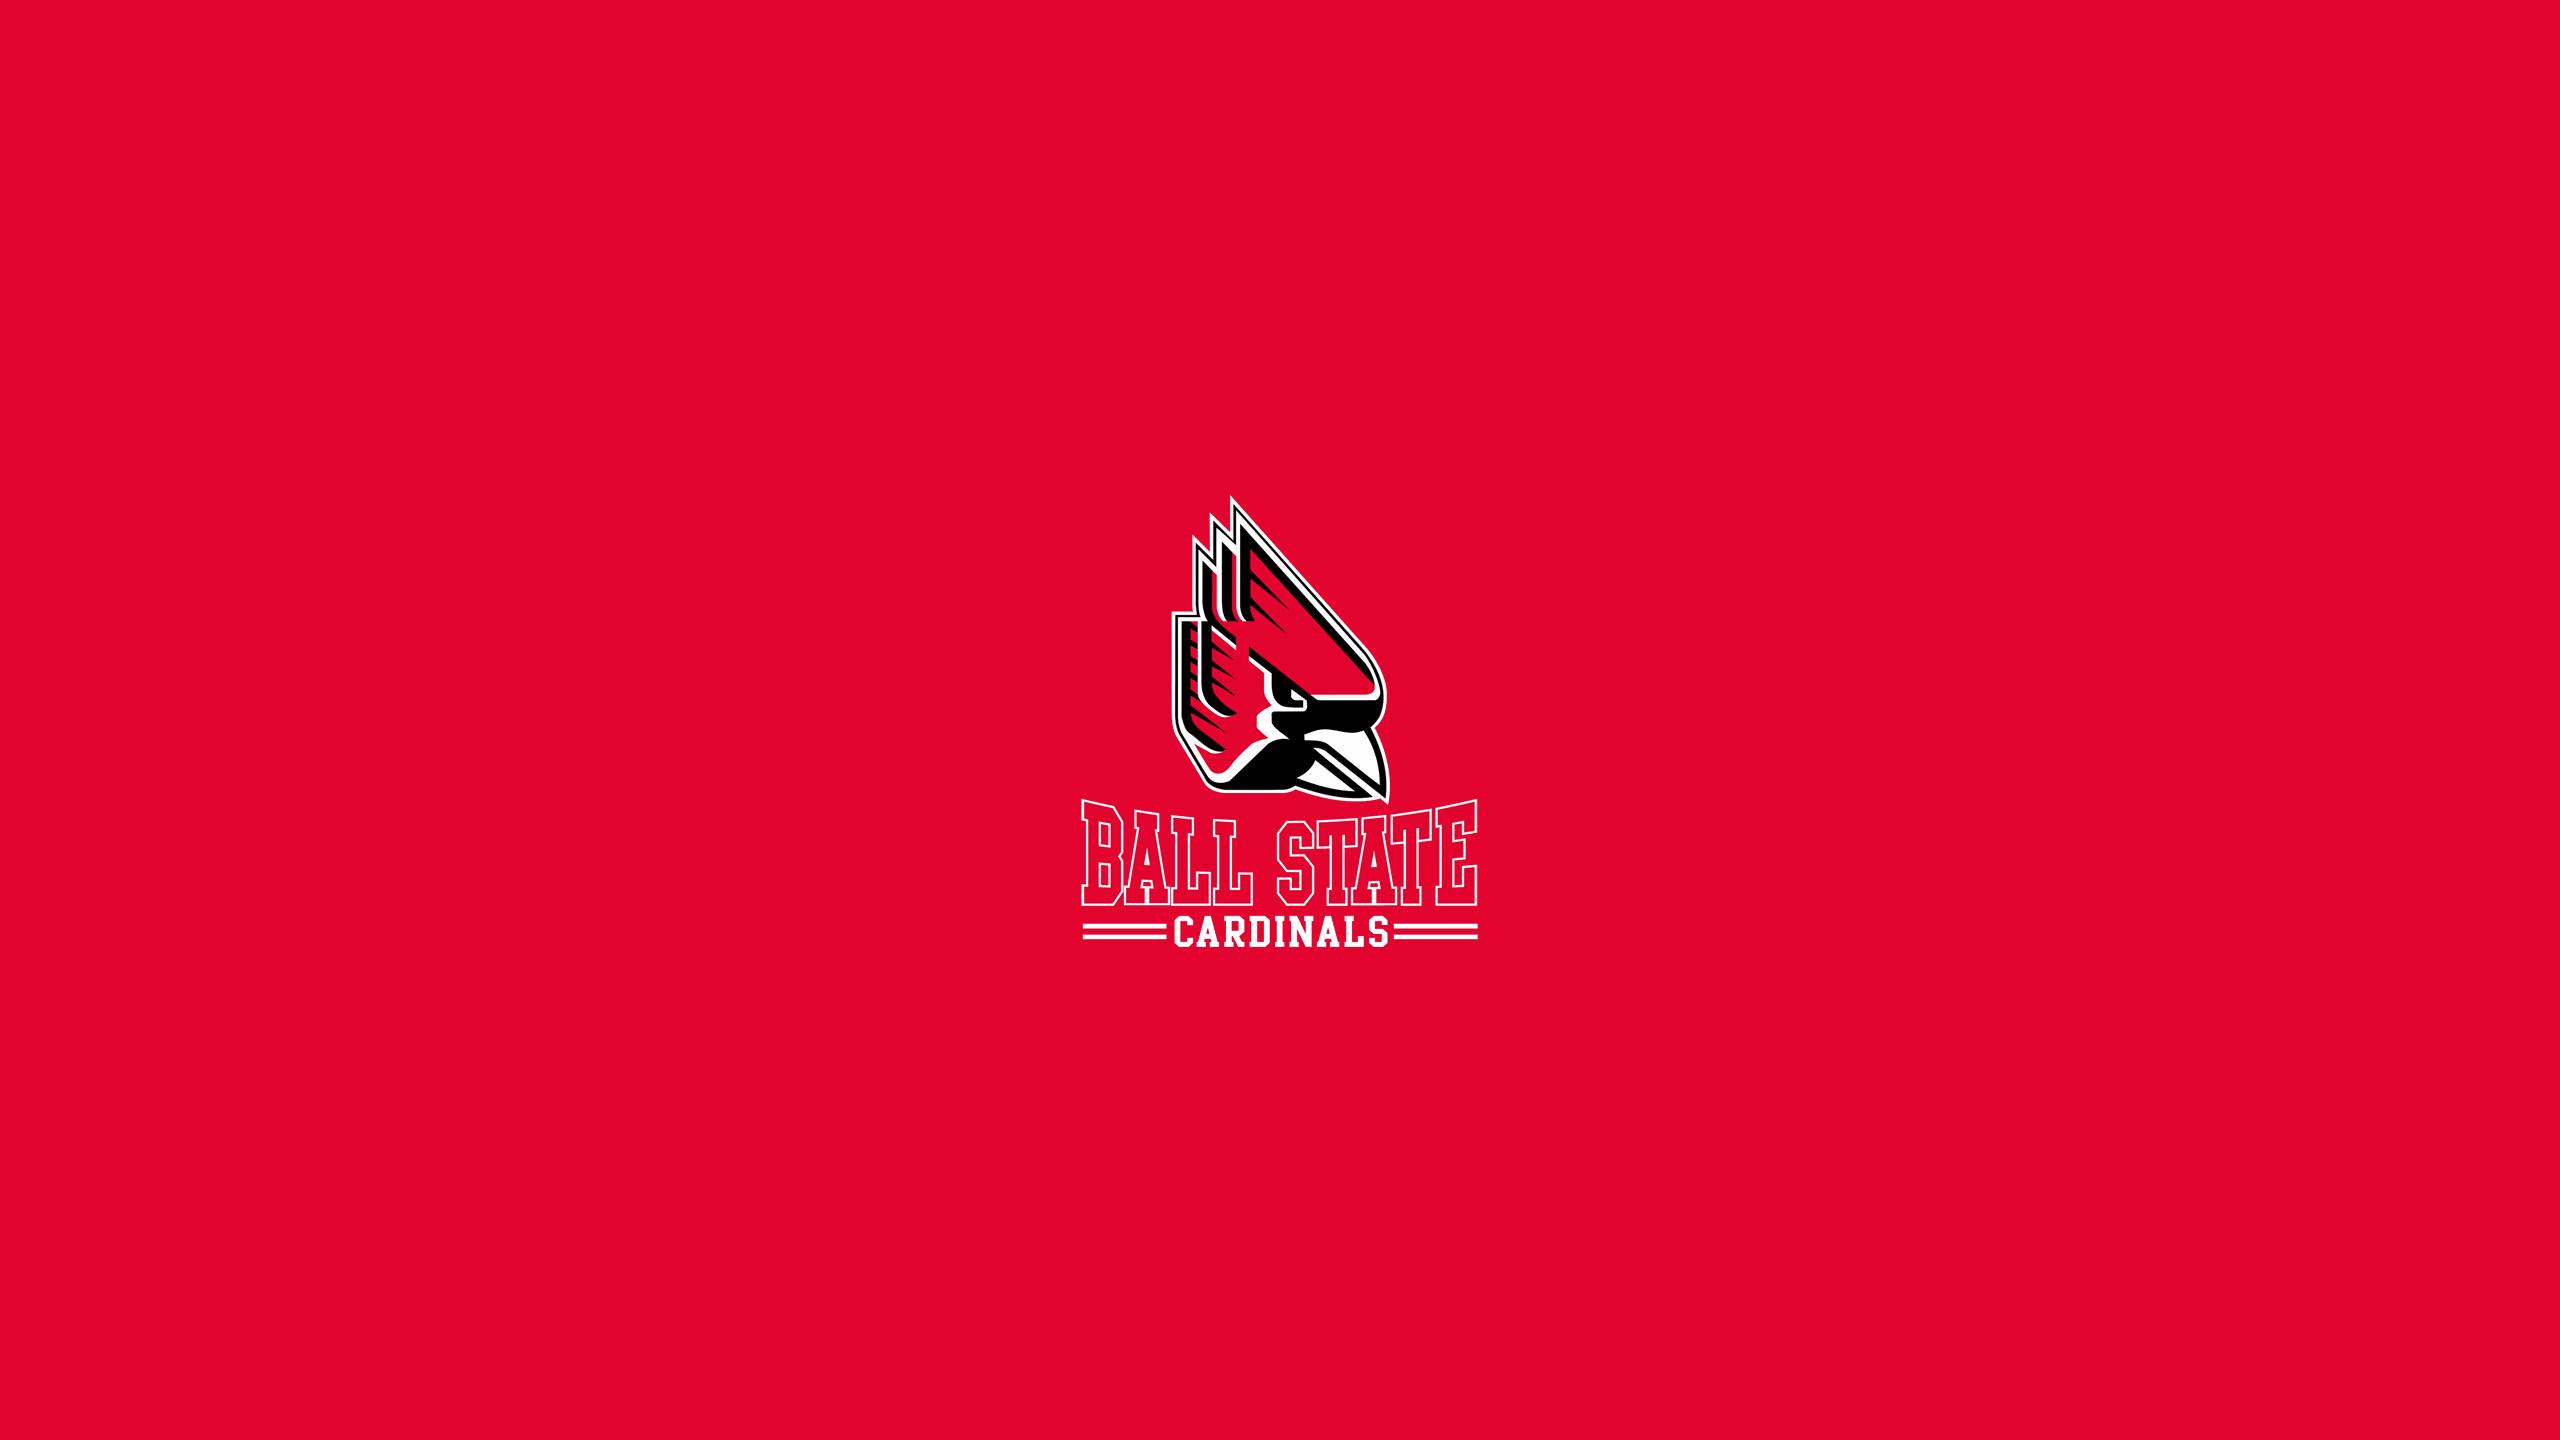 Ball State University Cardinals